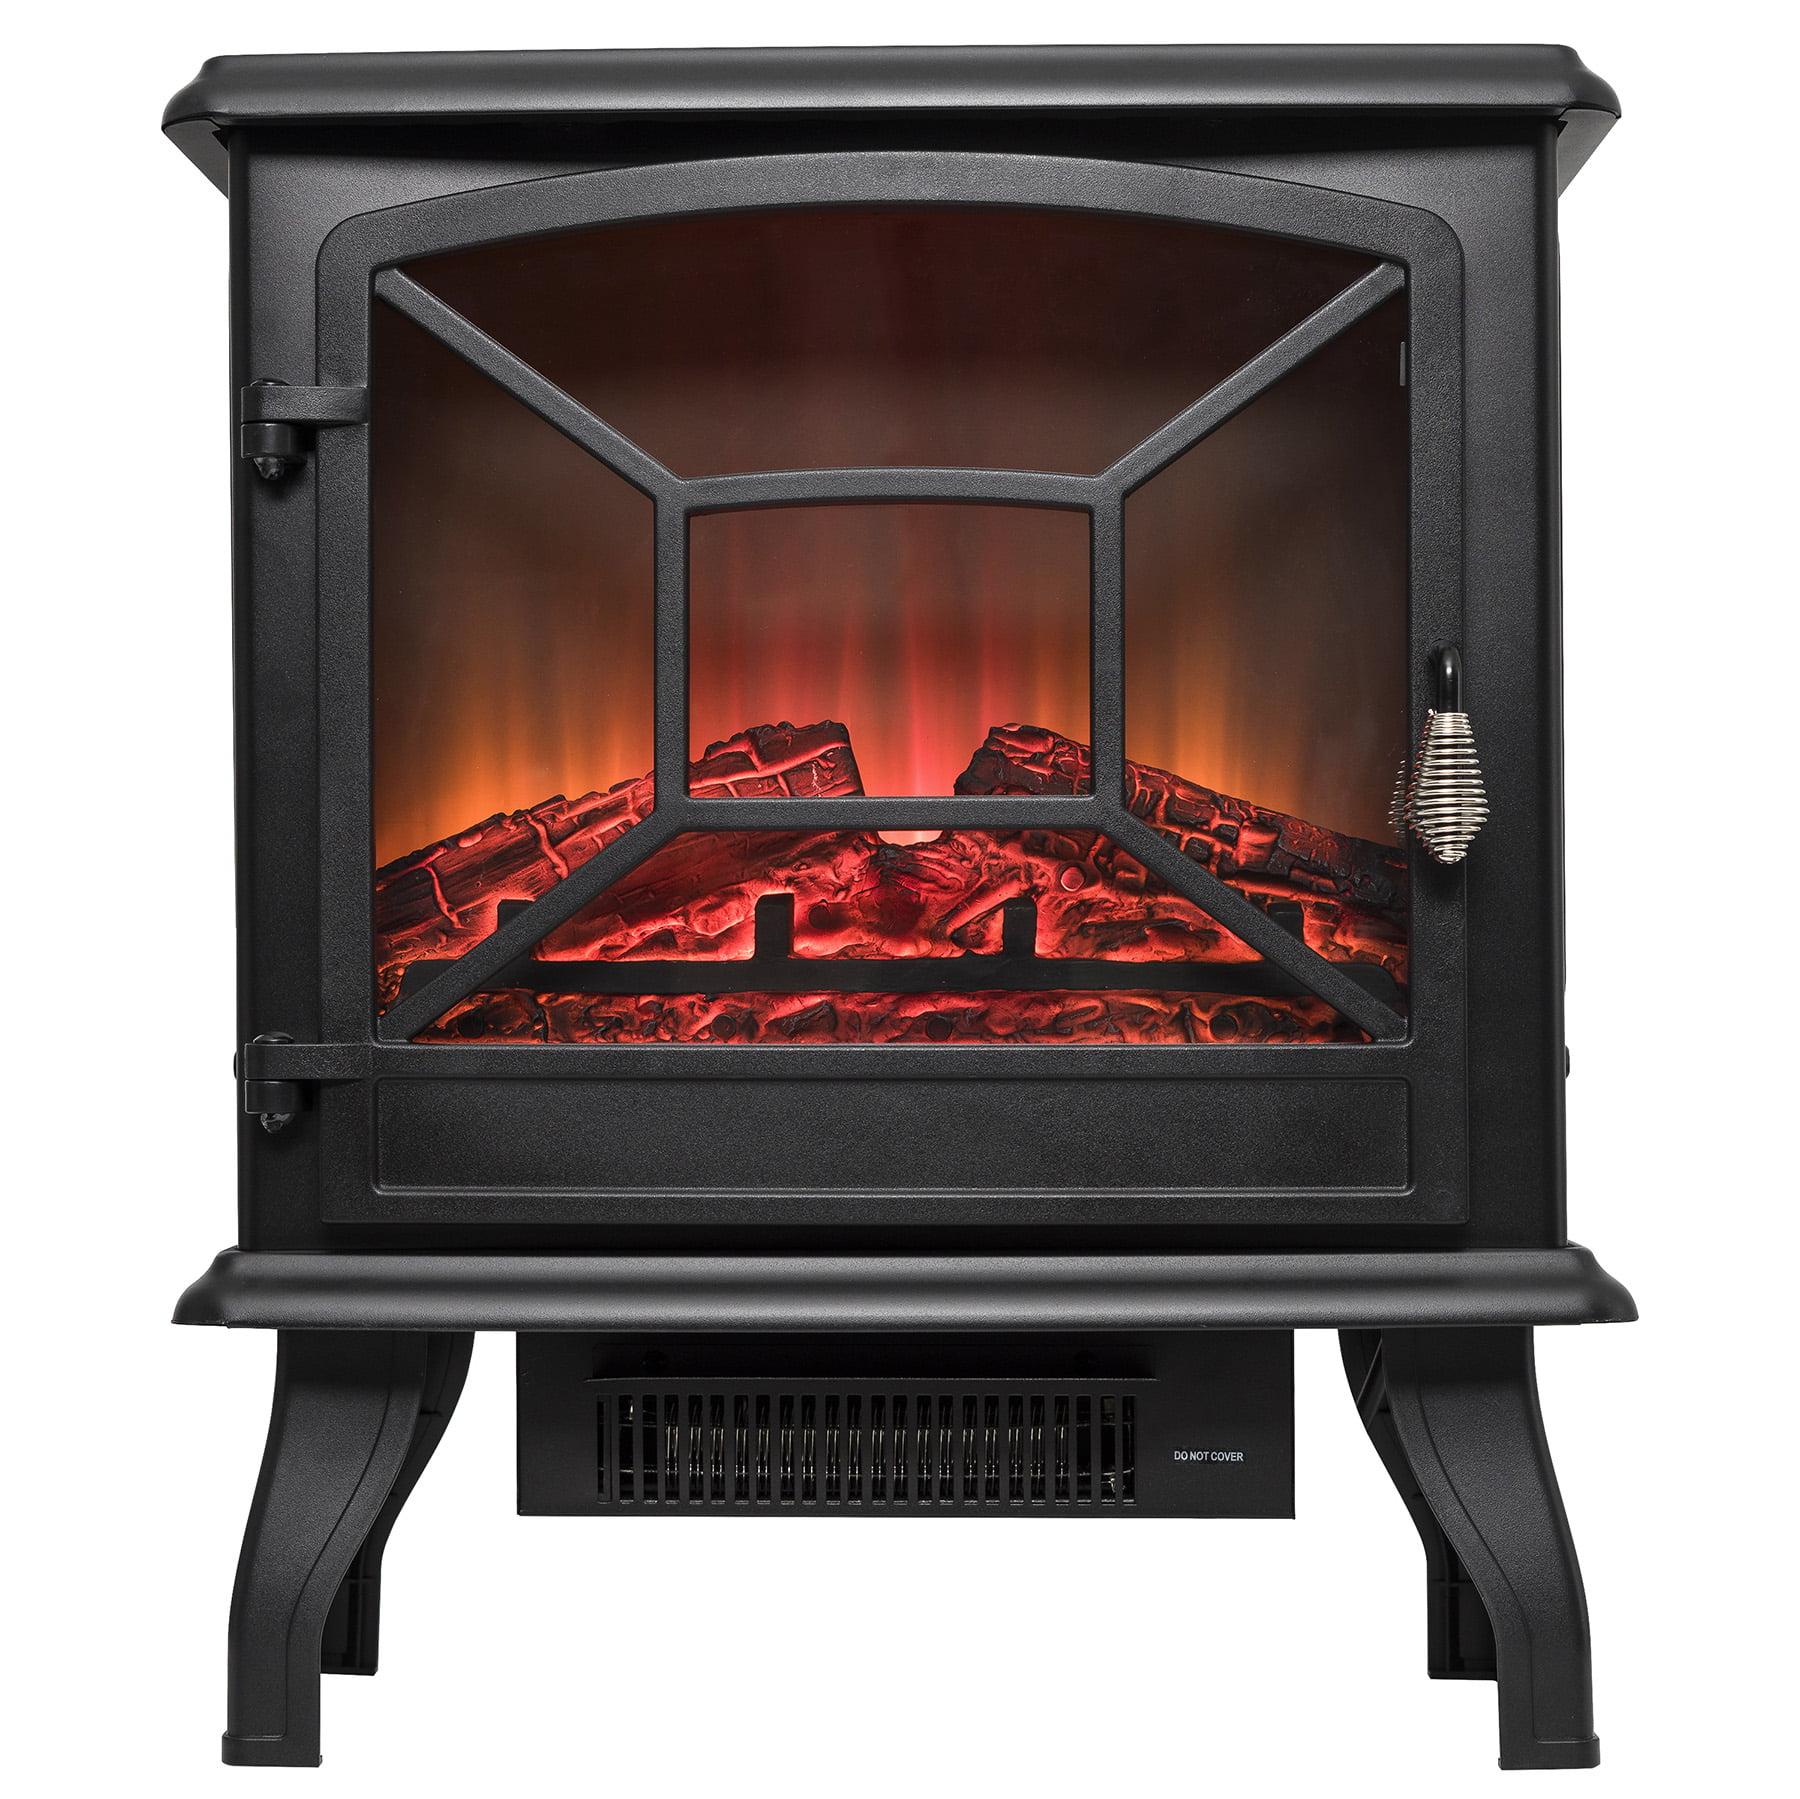 "AKDY FP0081 20"" Freestanding Portable Black Electric Fireplace 3D Flames Firebox Heater w/"